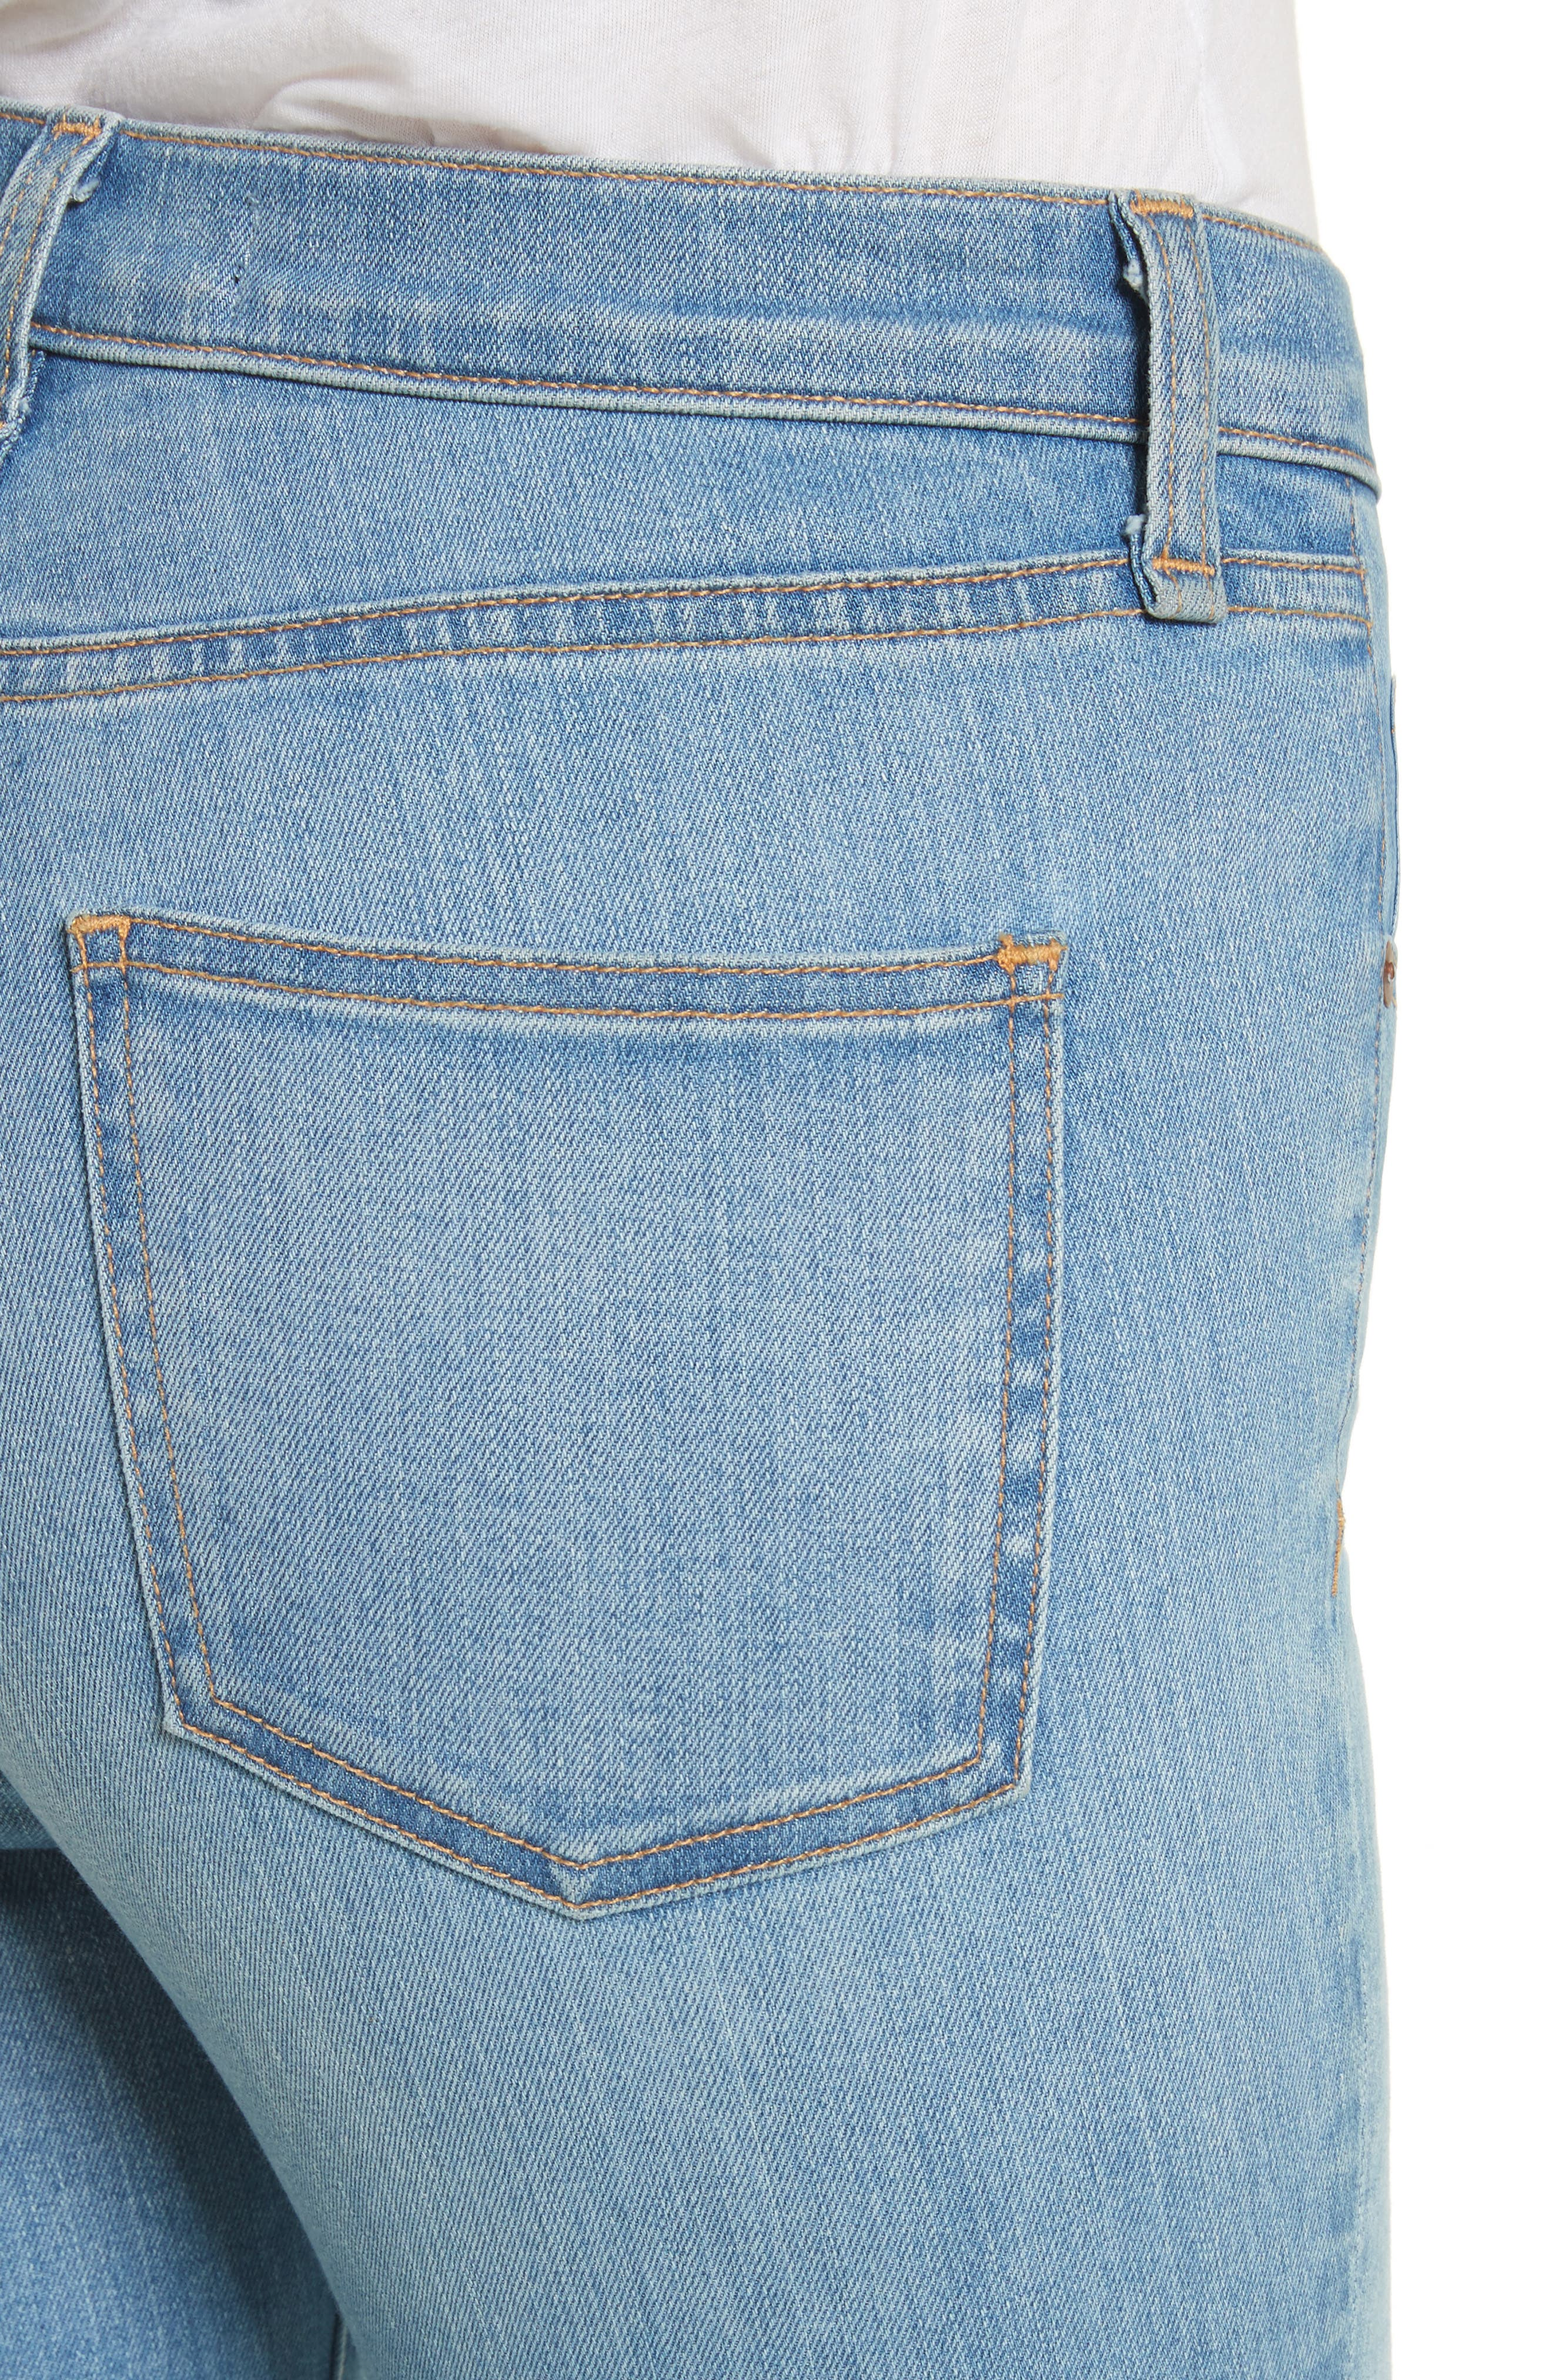 Debbie Frayed Crop Skinny Jeans,                             Alternate thumbnail 14, color,